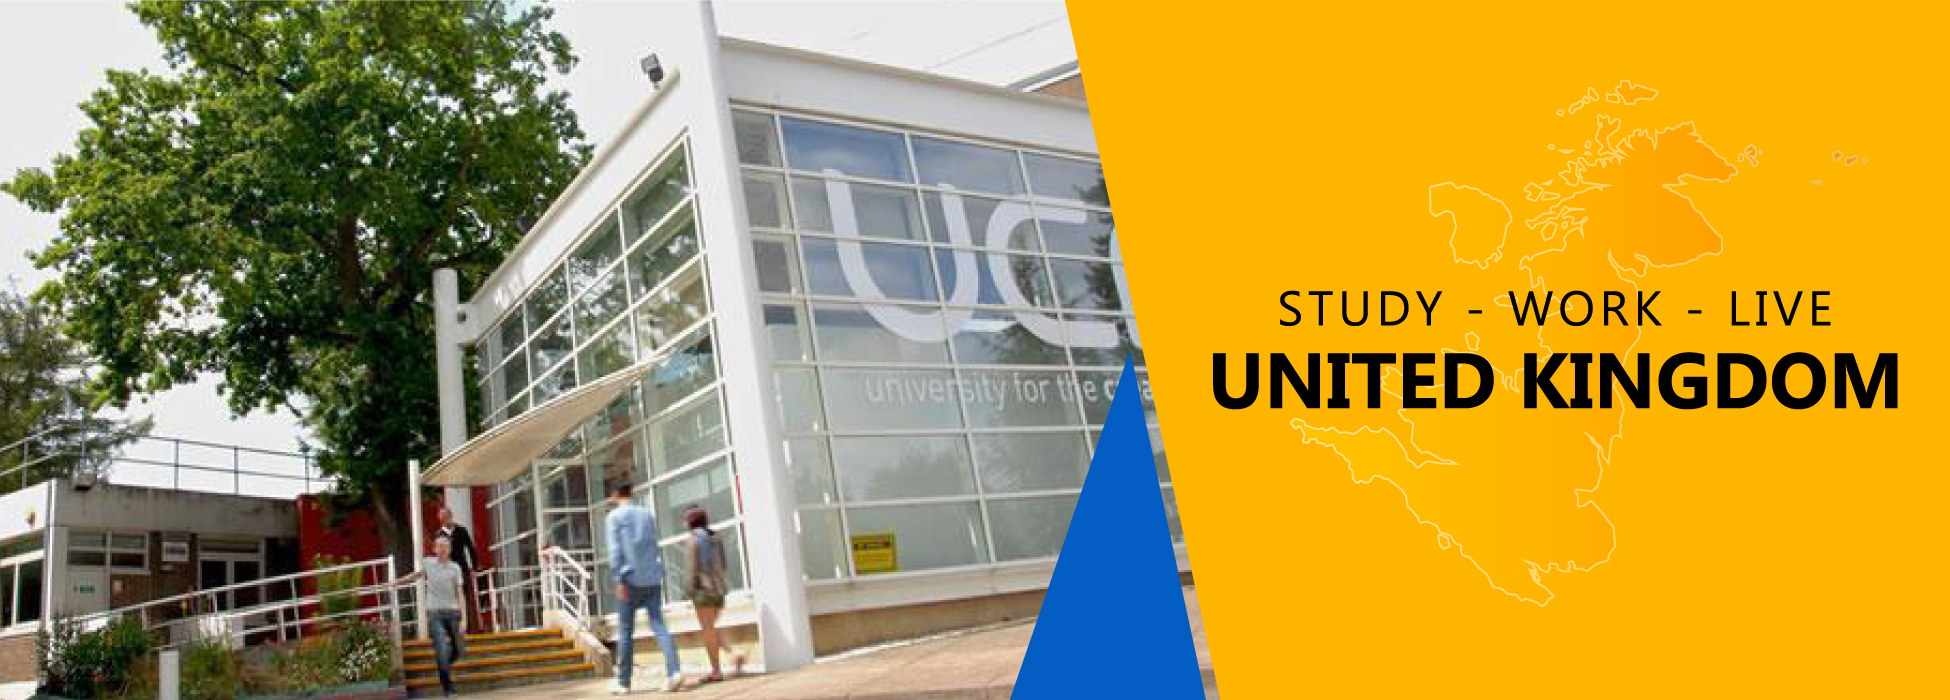 University-for-the-Creative-Arts